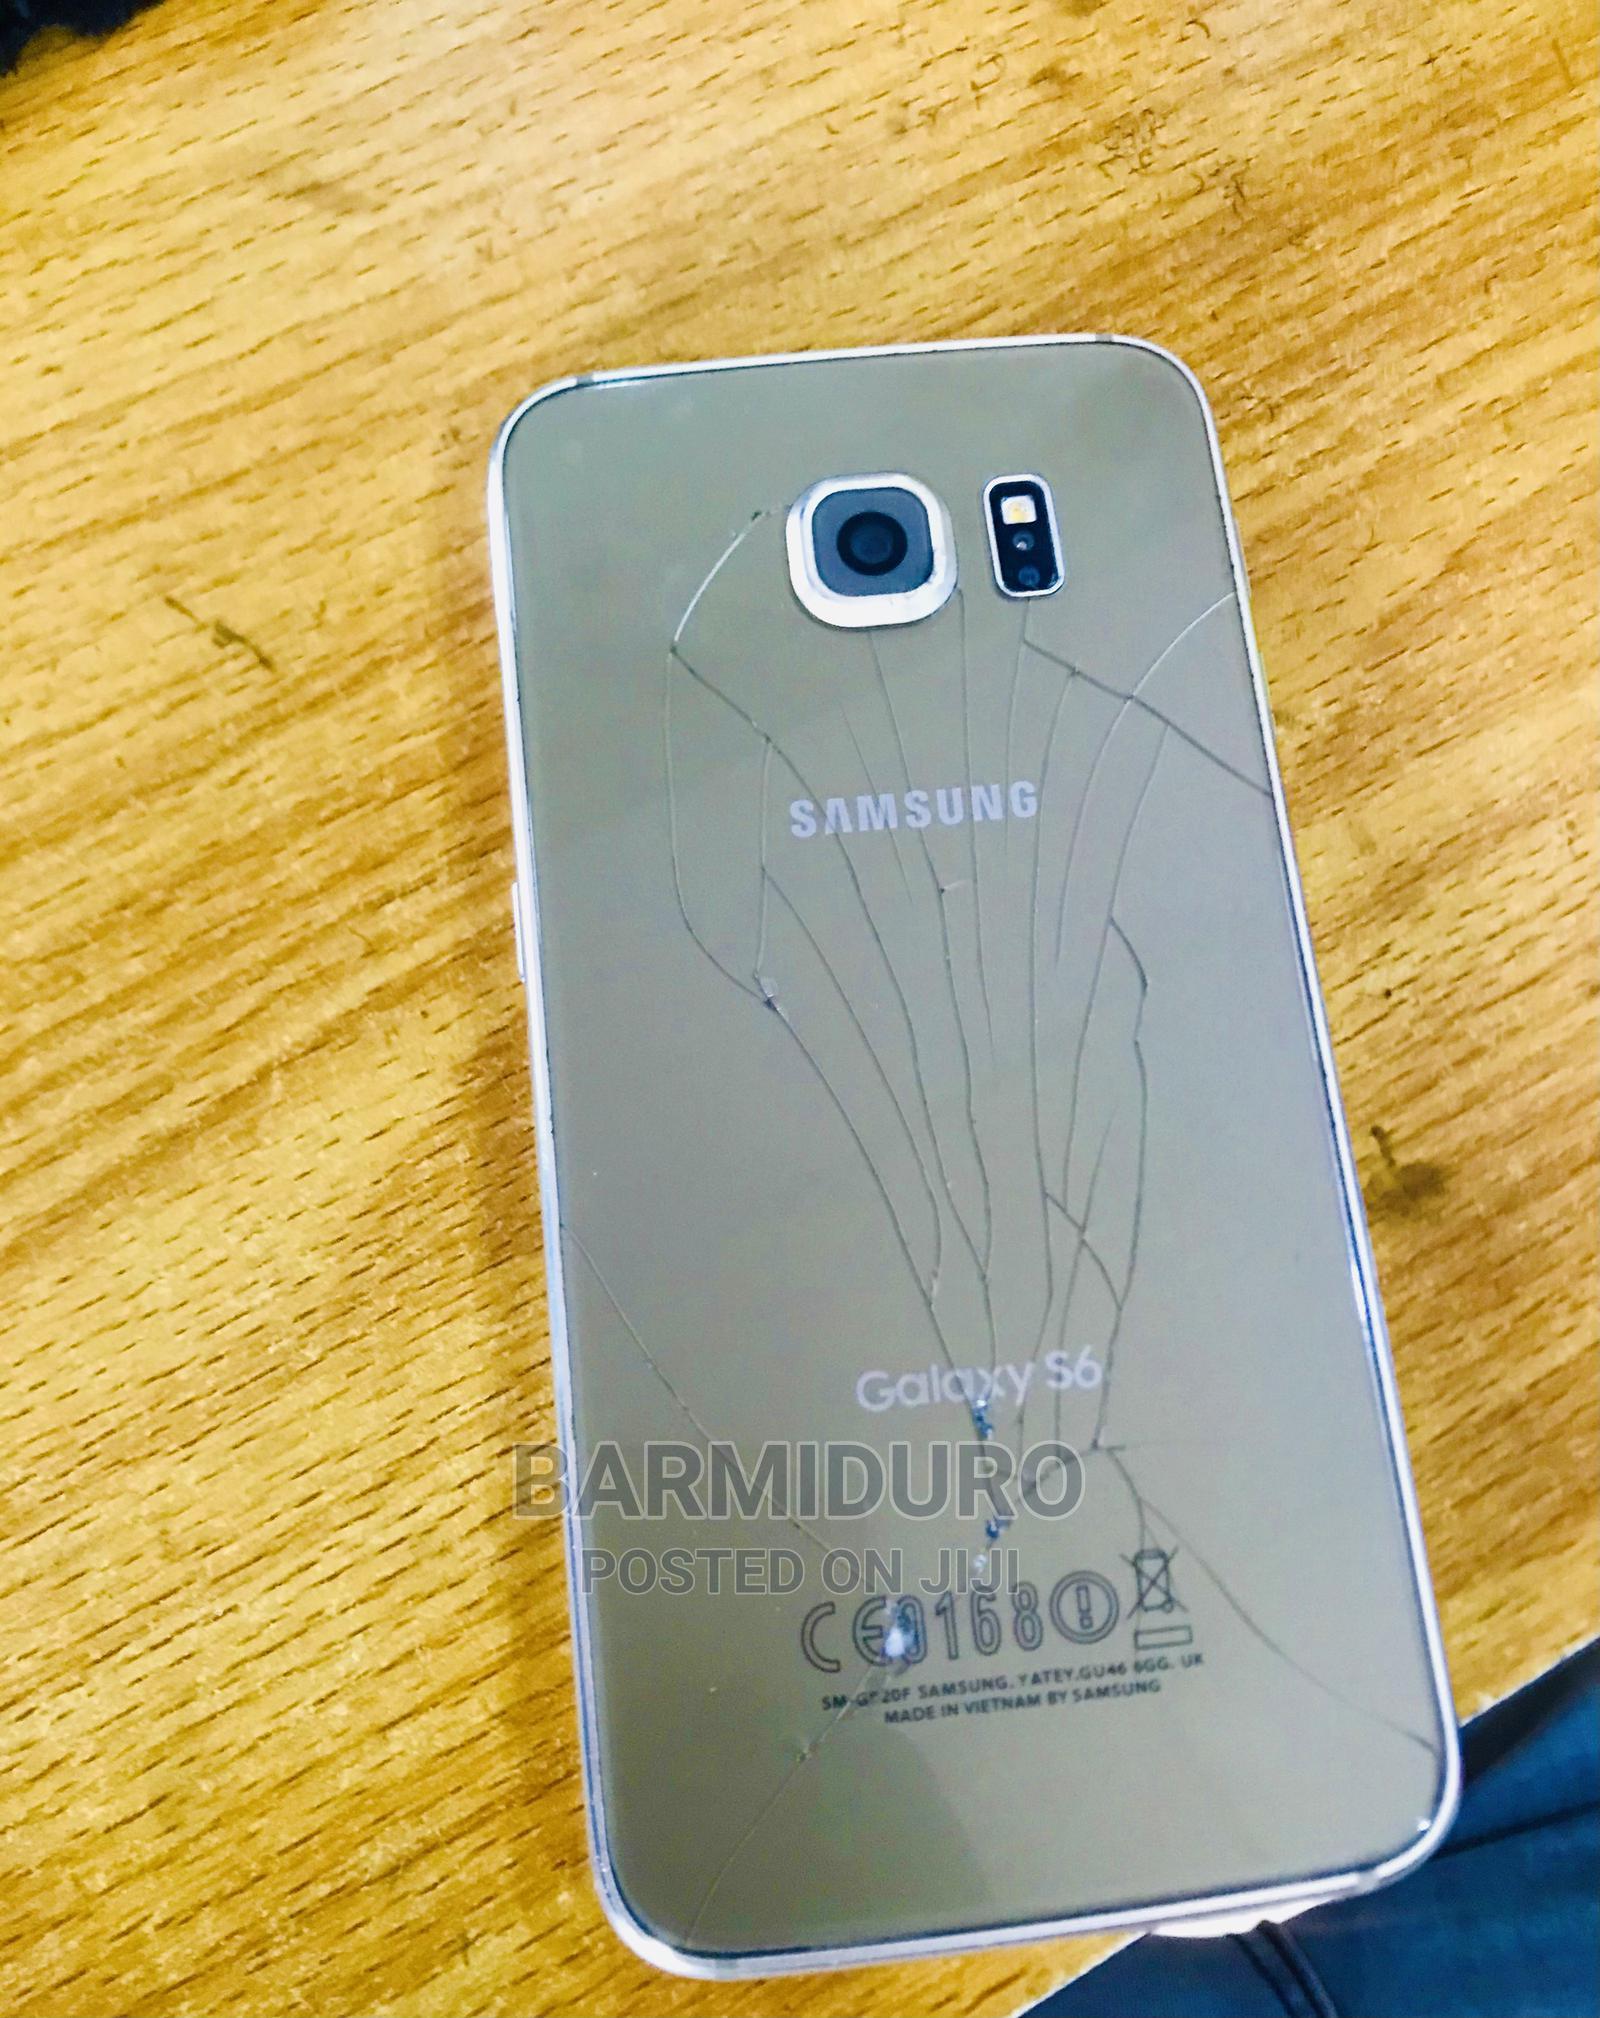 Samsung Galaxy S6 Plus 32 GB Gold   Mobile Phones for sale in Osogbo, Osun State, Nigeria